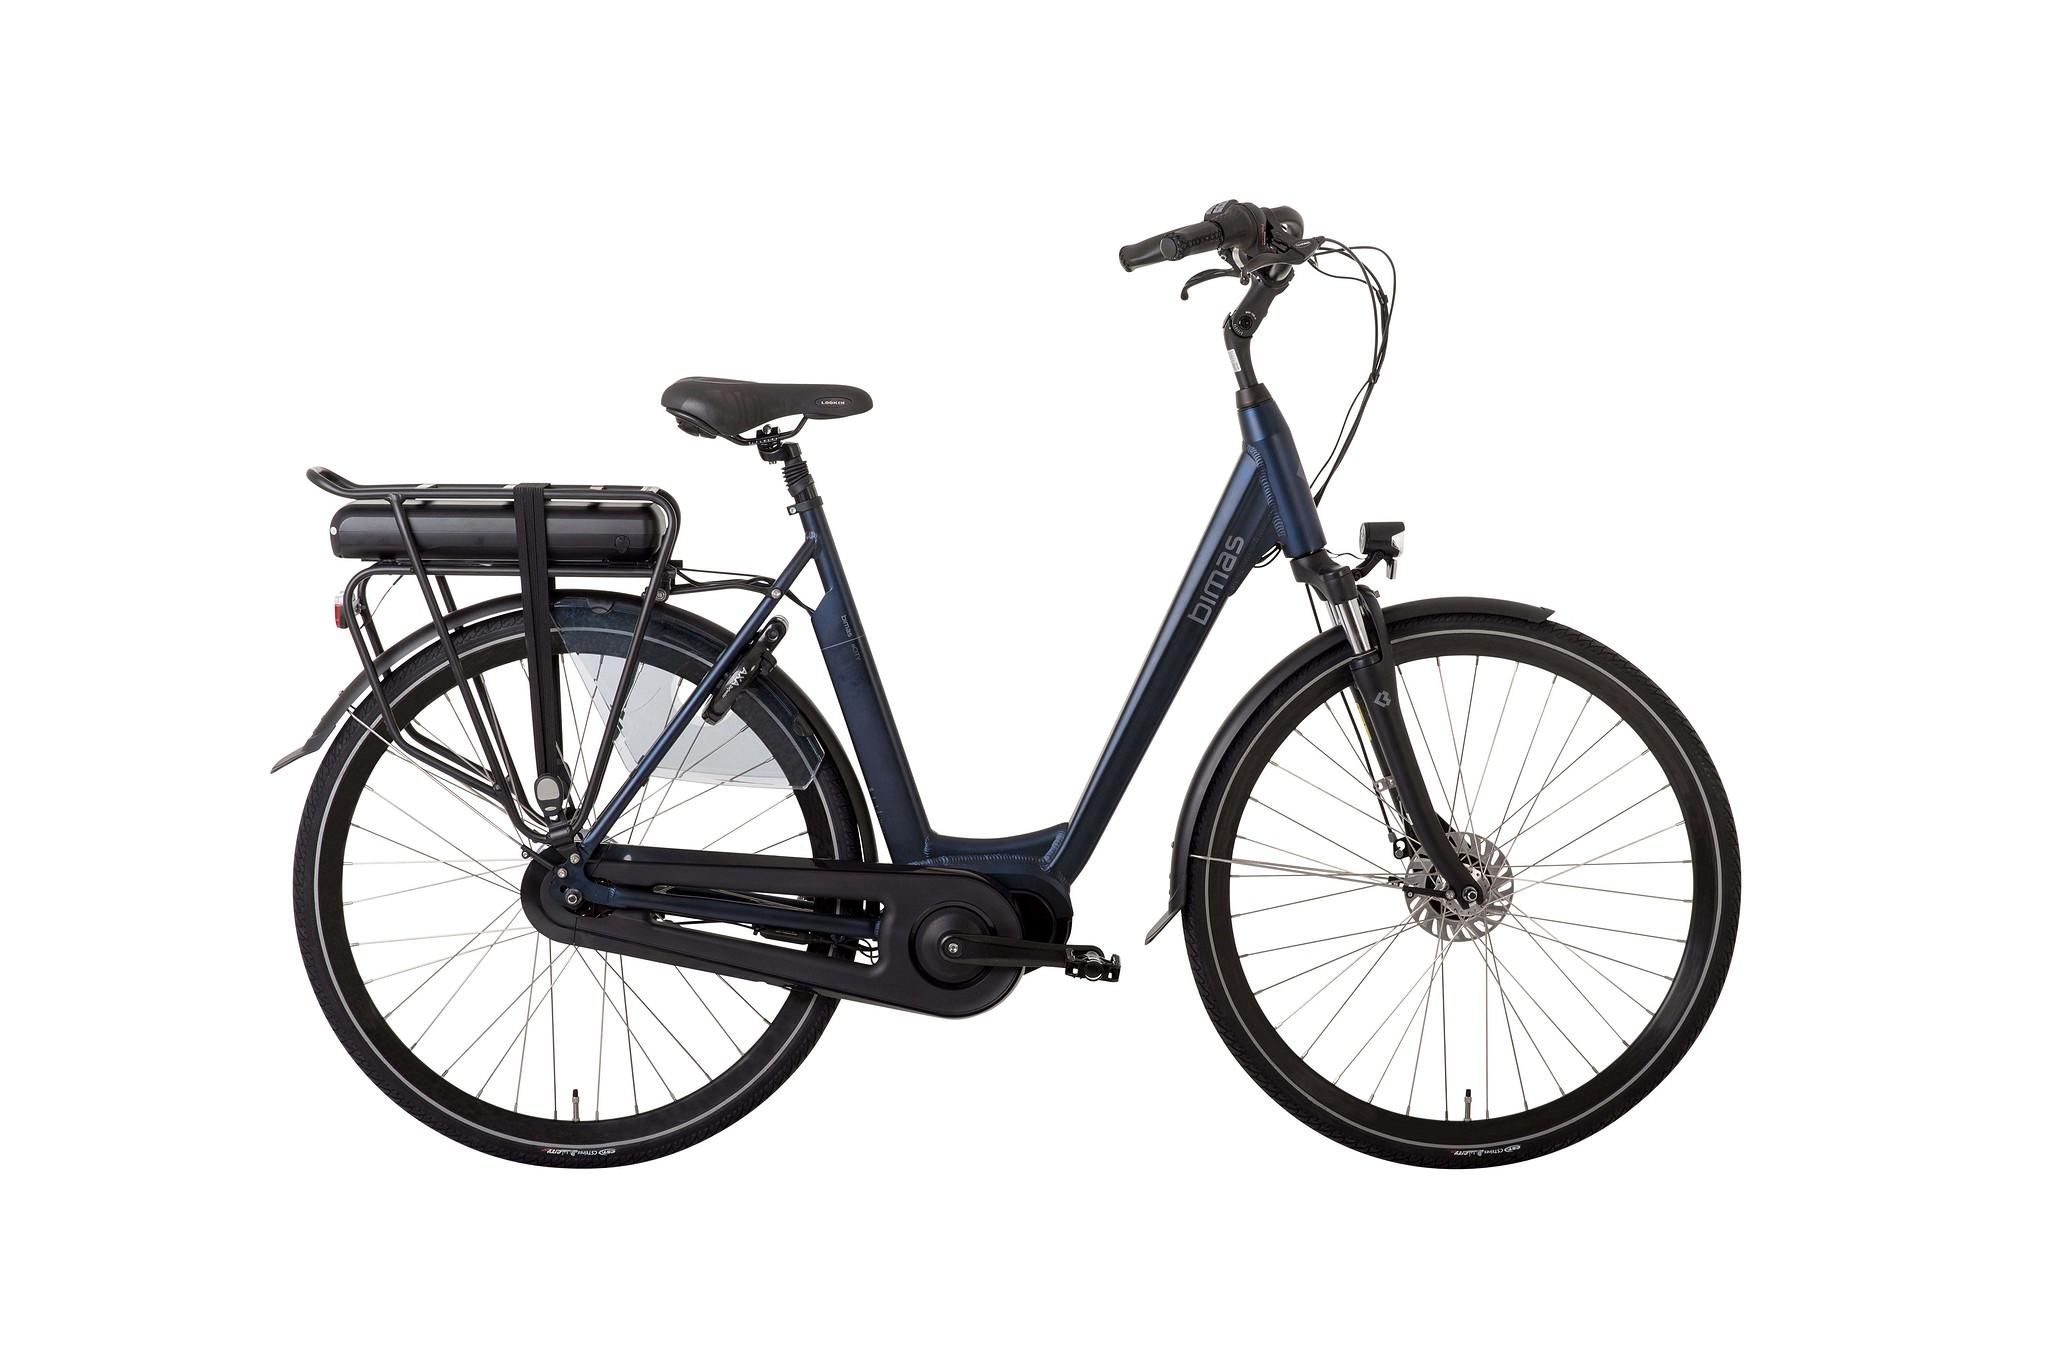 Bimas Elektrische fiets E-City 7.3 dames navy blauw 50cm 450 Watt Blauw